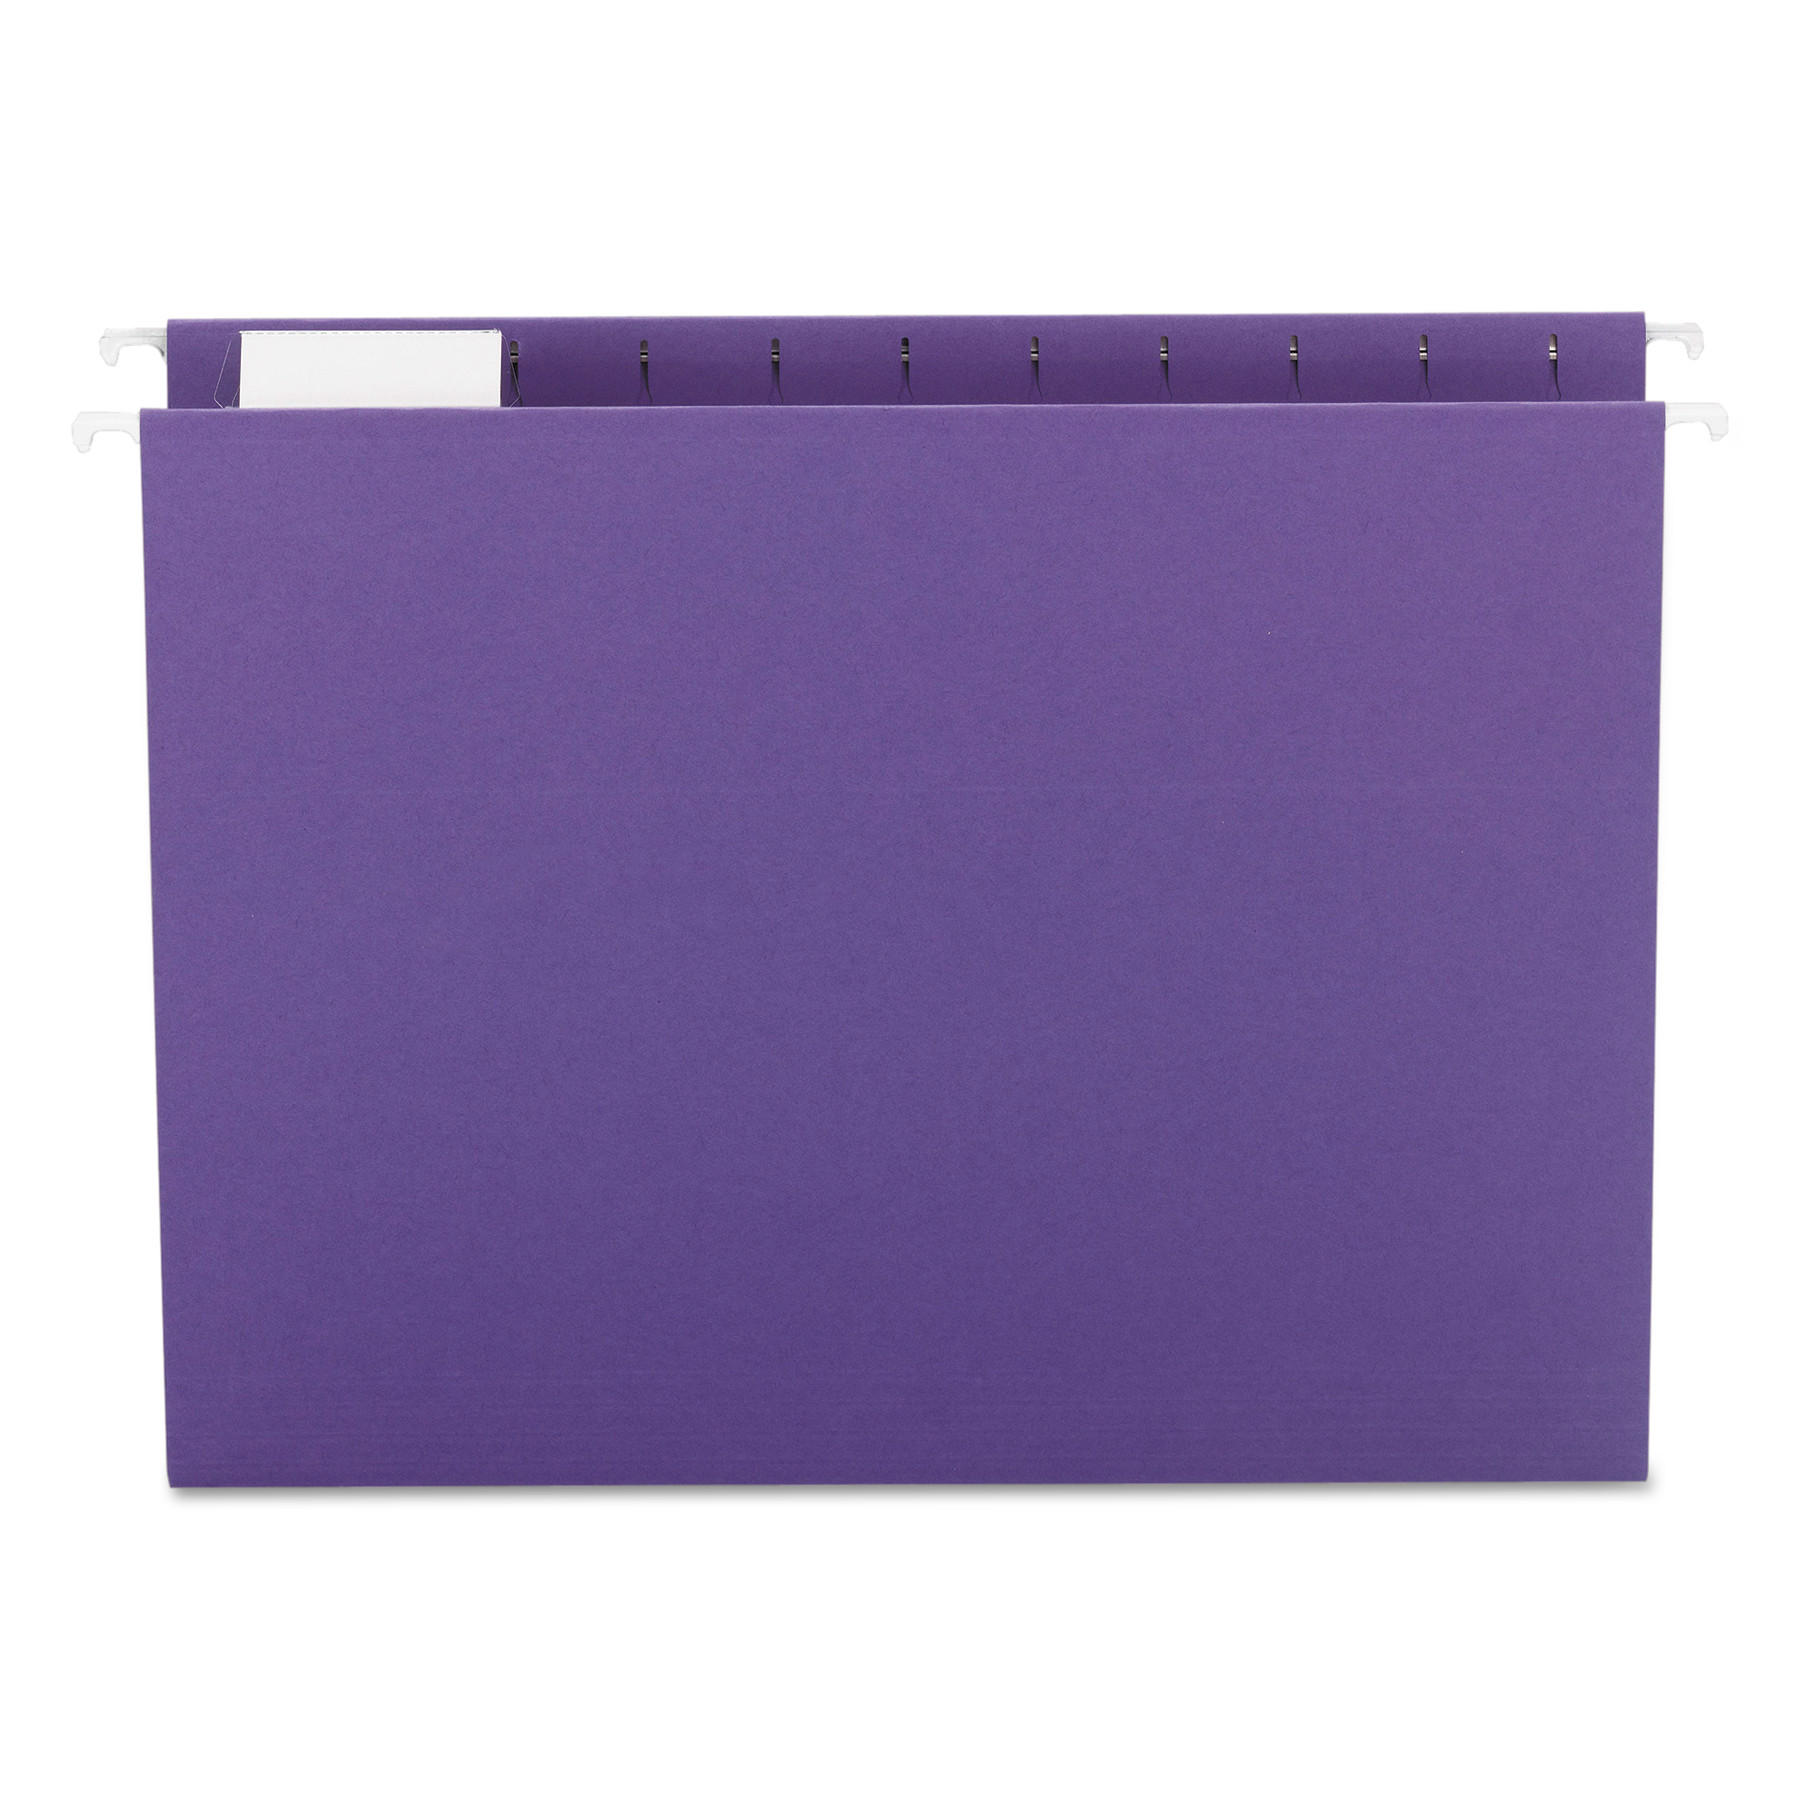 Smead Hanging File Folder with Tab, 1/5-Cut Adjustable Tab, Letter Size, Purple, 25 per Box (64072)